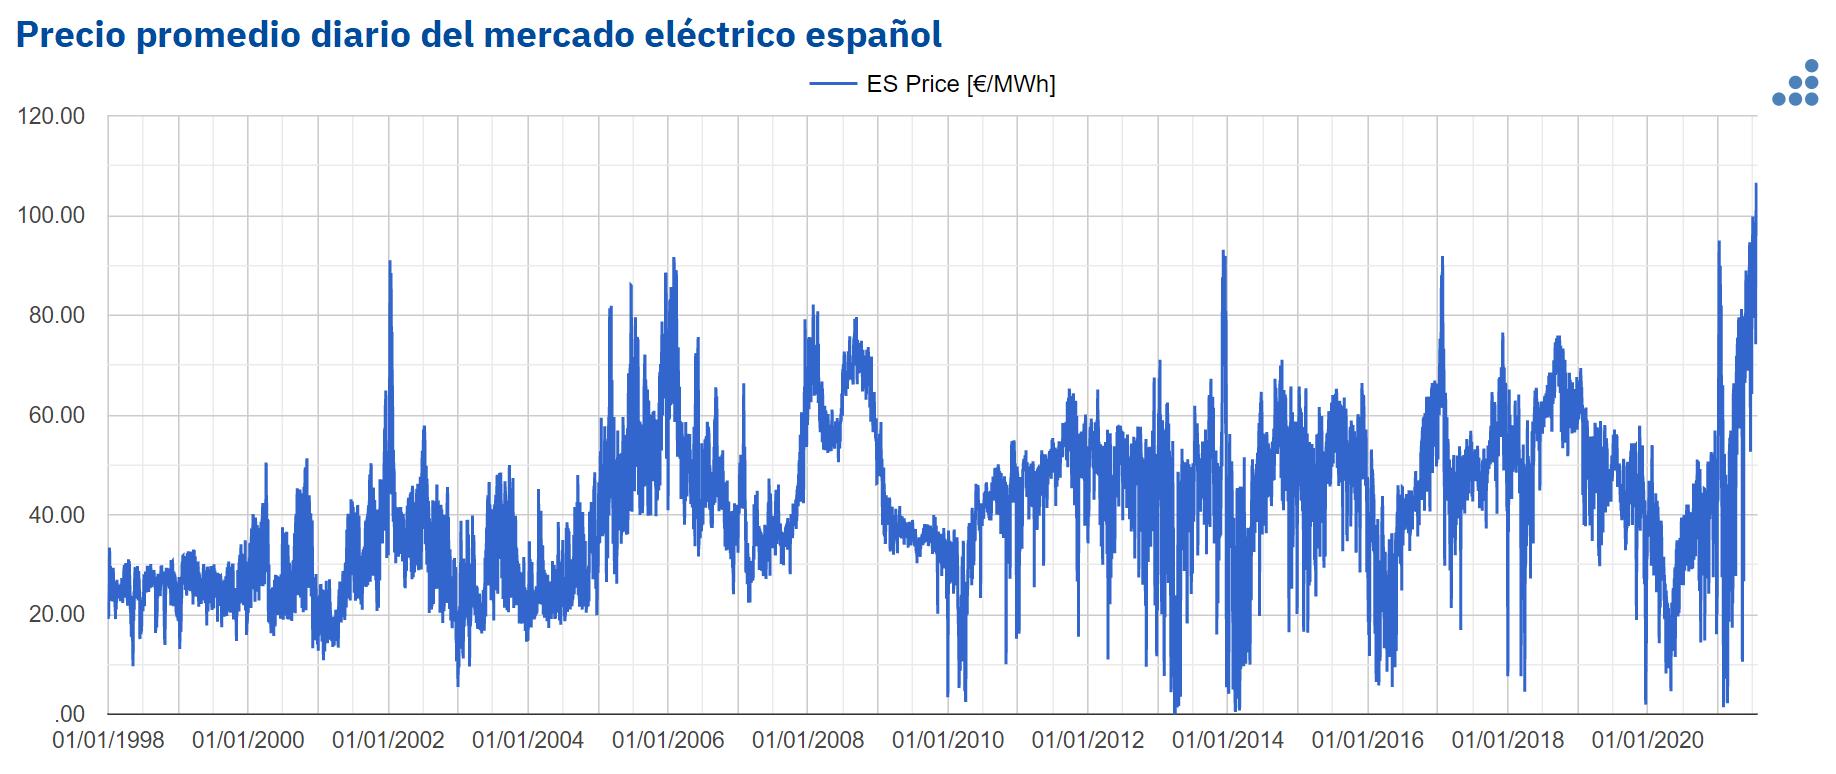 AleaSoft - precio diario mercado electrico espana